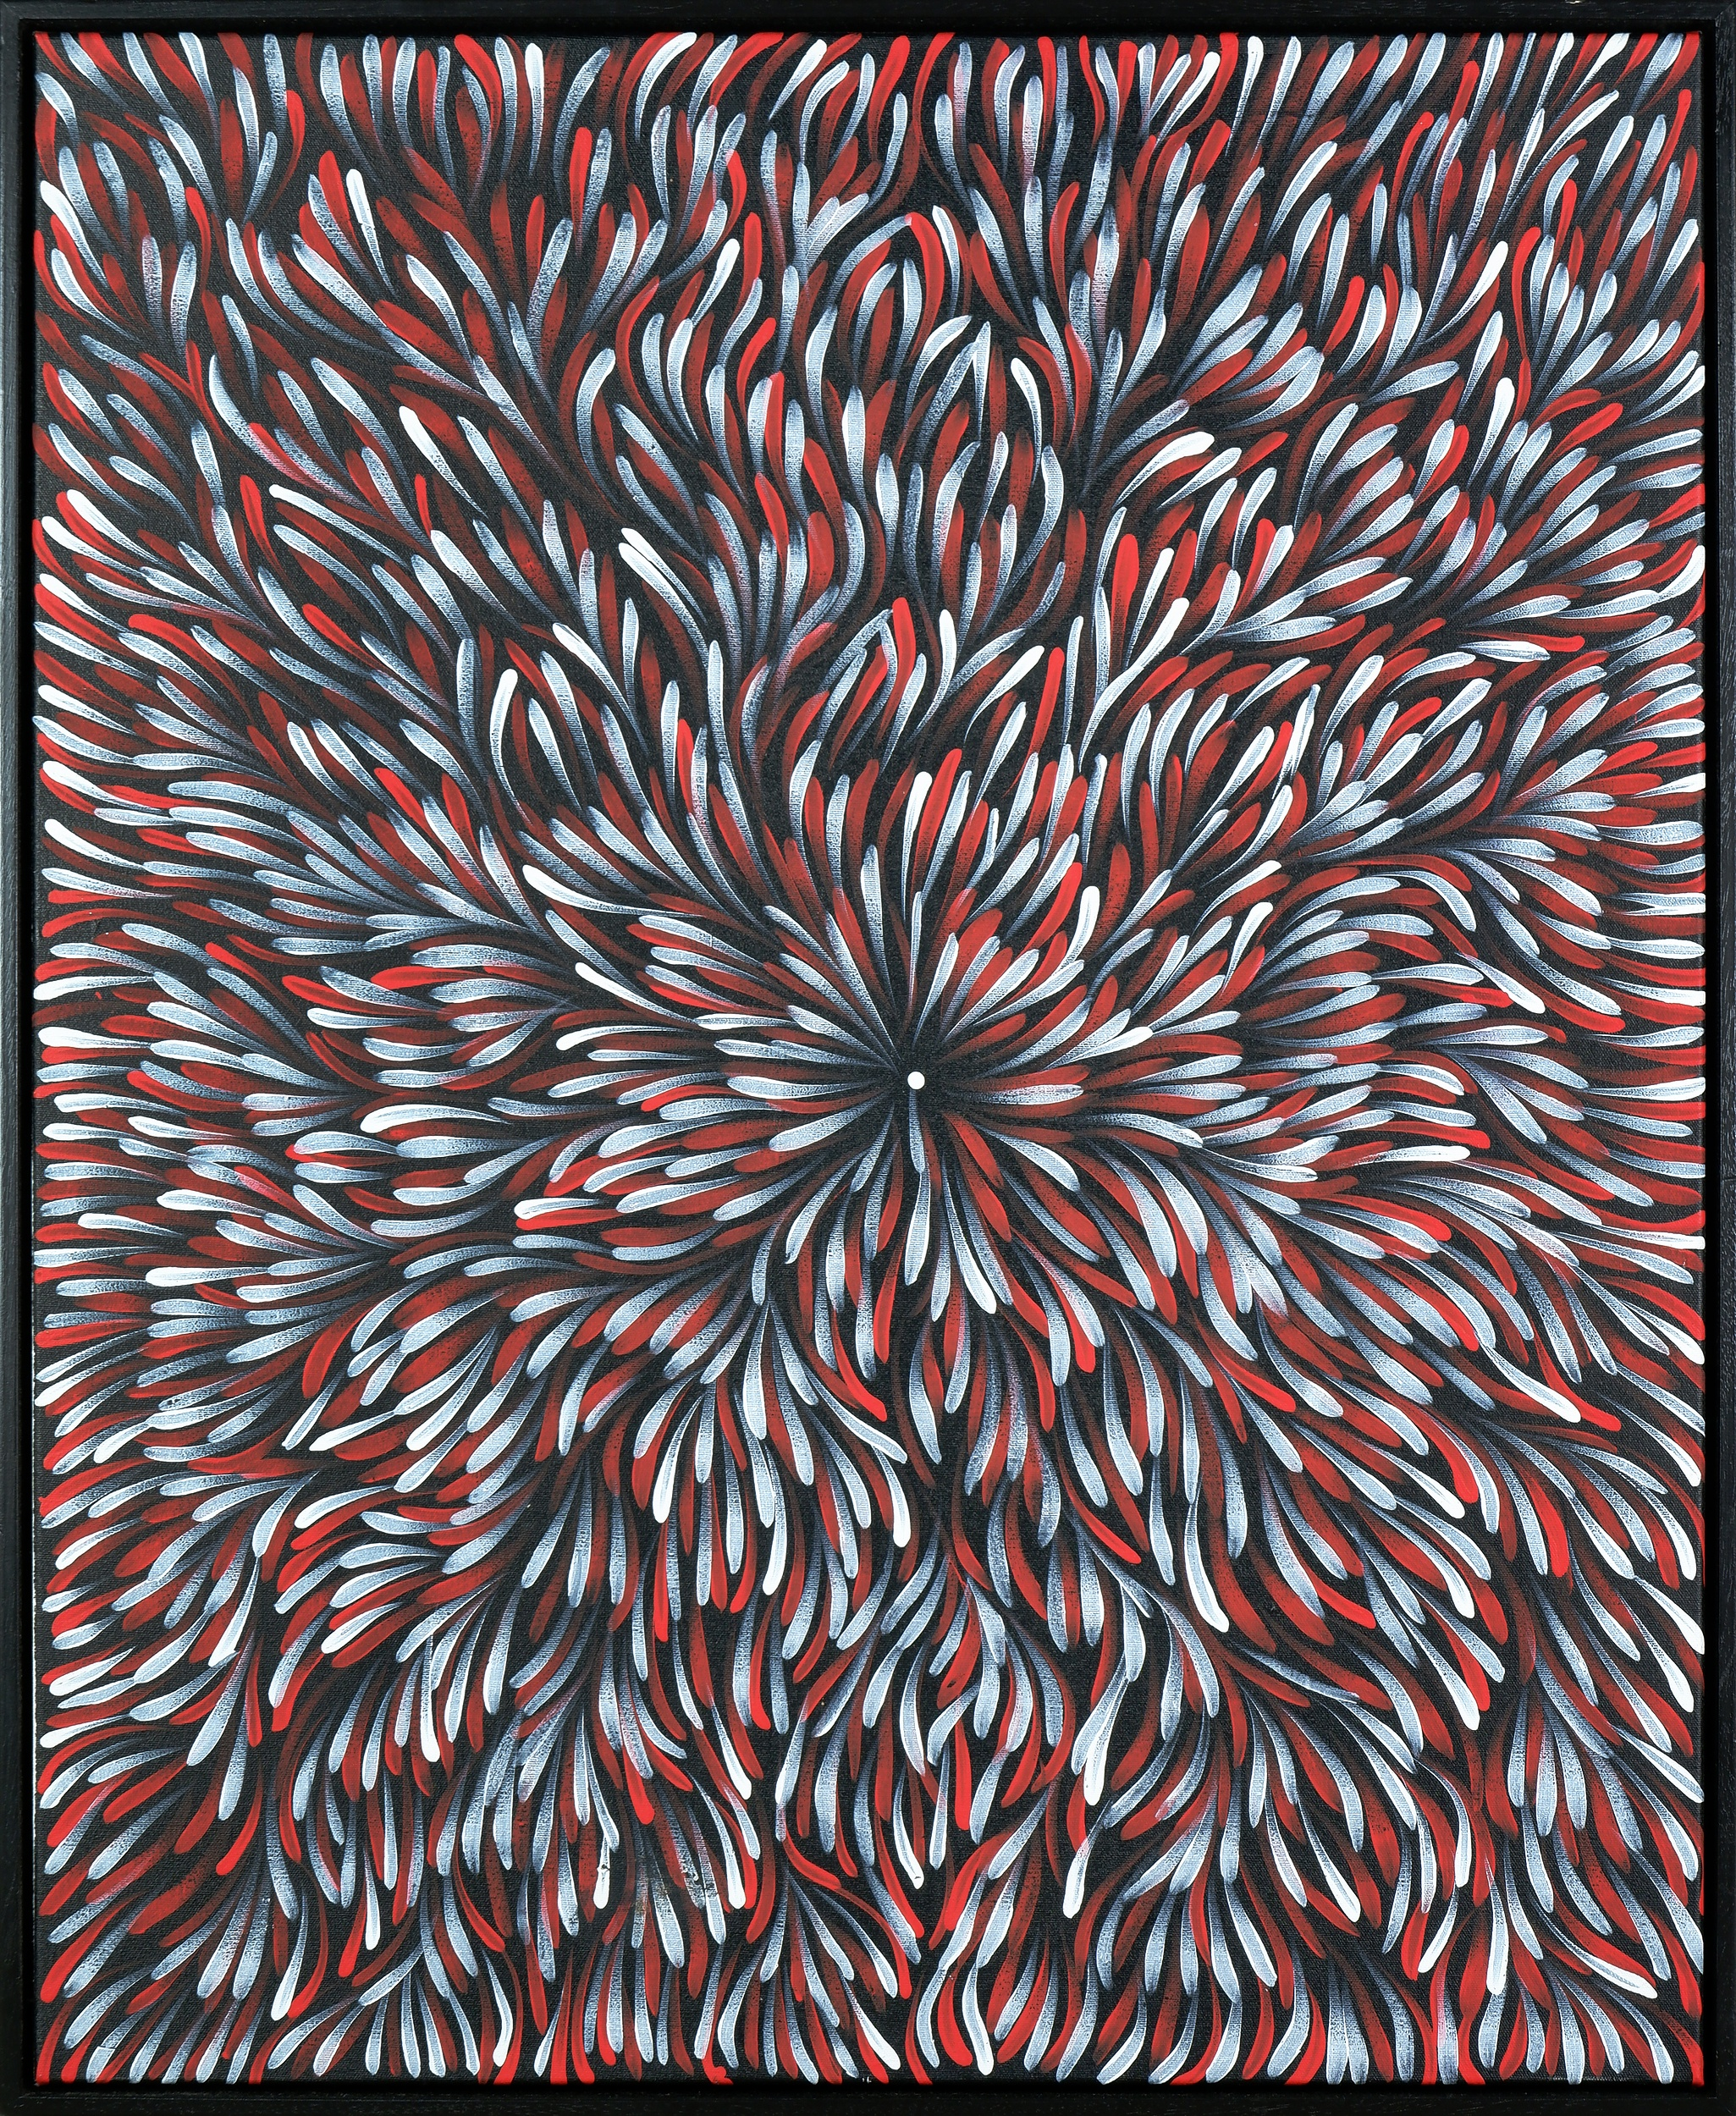 'Margaret Price (born c1945, Anmatyerre/ Alyawarr language group), Bush Medicine, Synthetic Polymer Paint on Canvas, 90 x 73 cm'